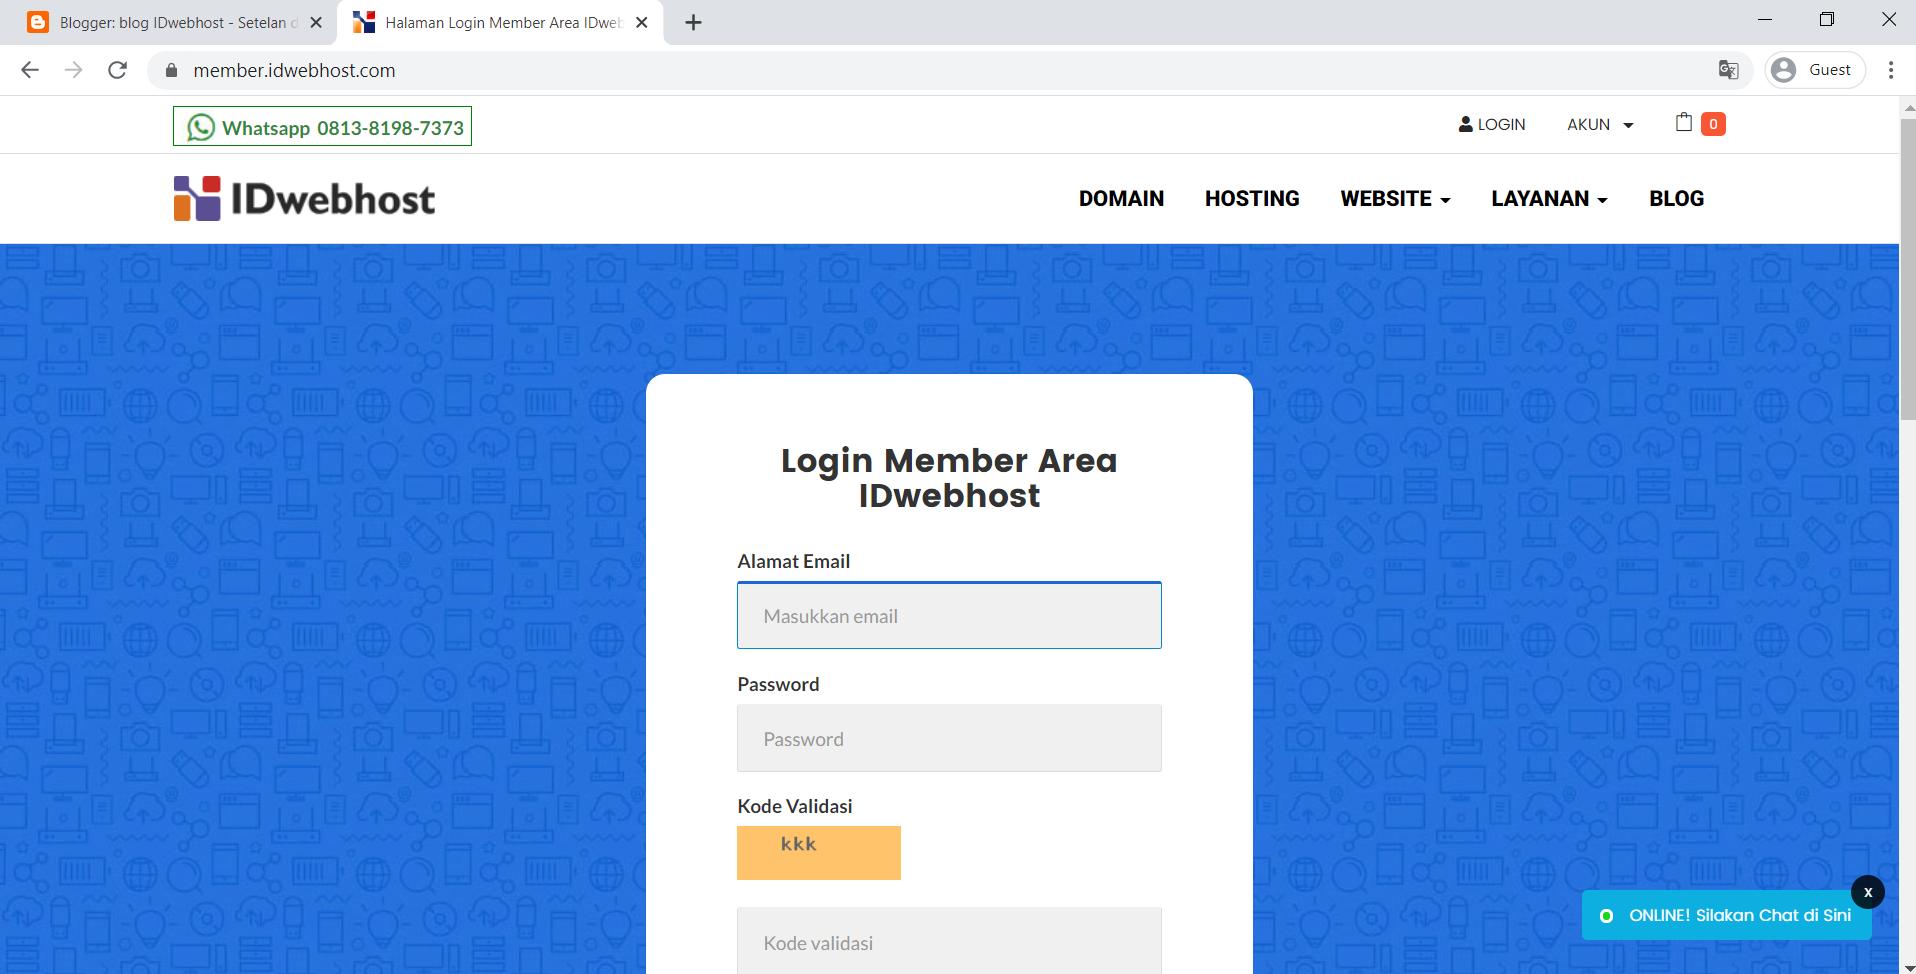 member idwebhost